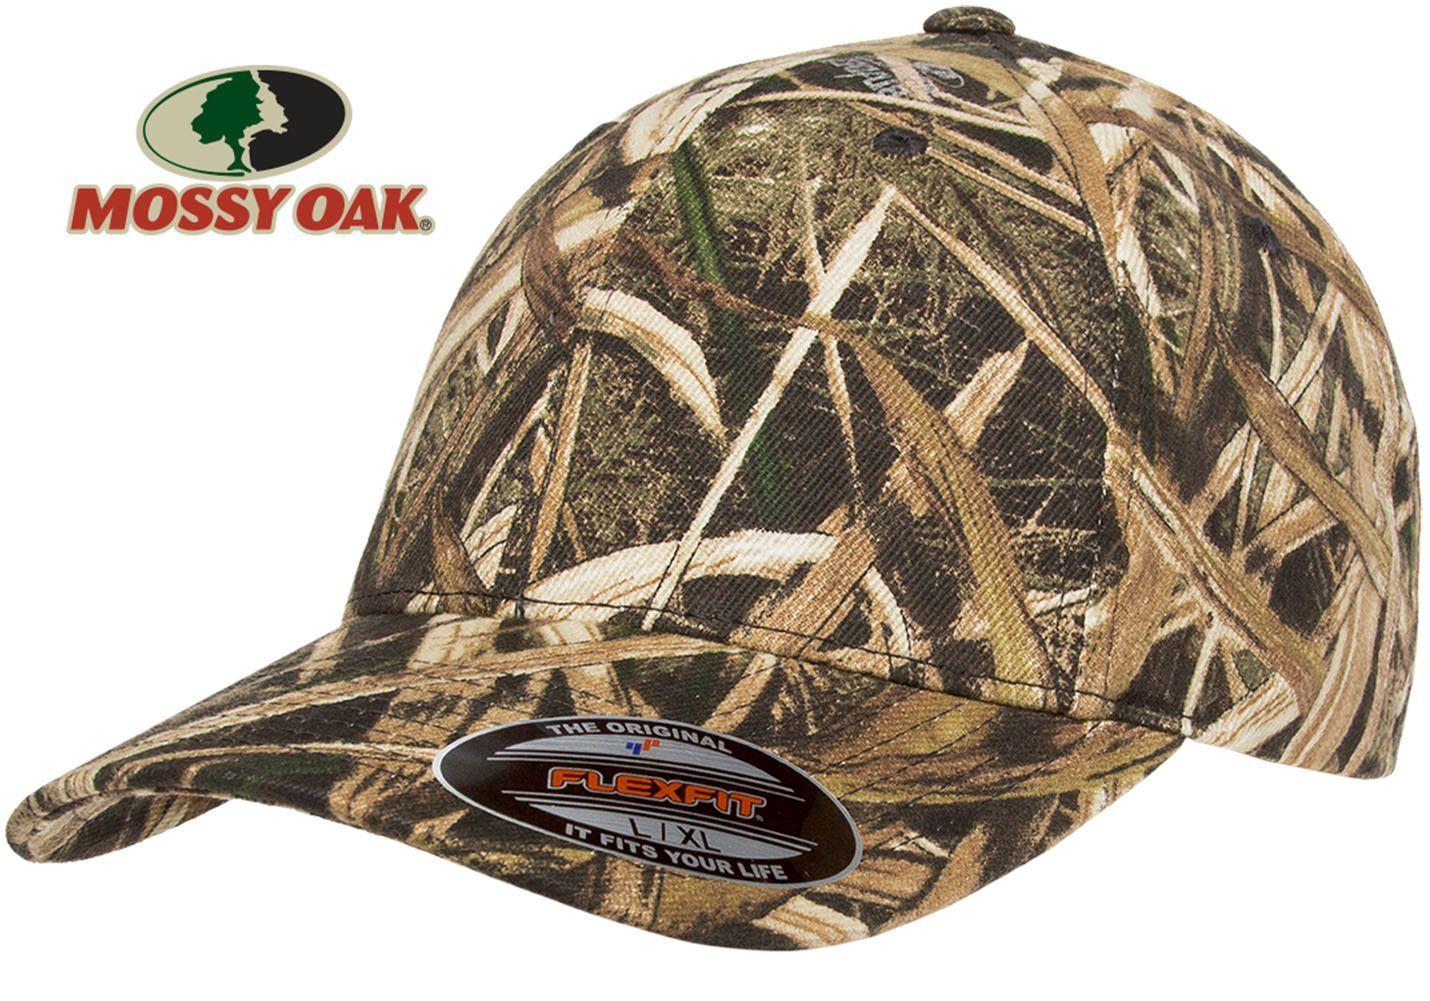 Flexfityupoong 6999mosg mossy oak shadow grass blades hat